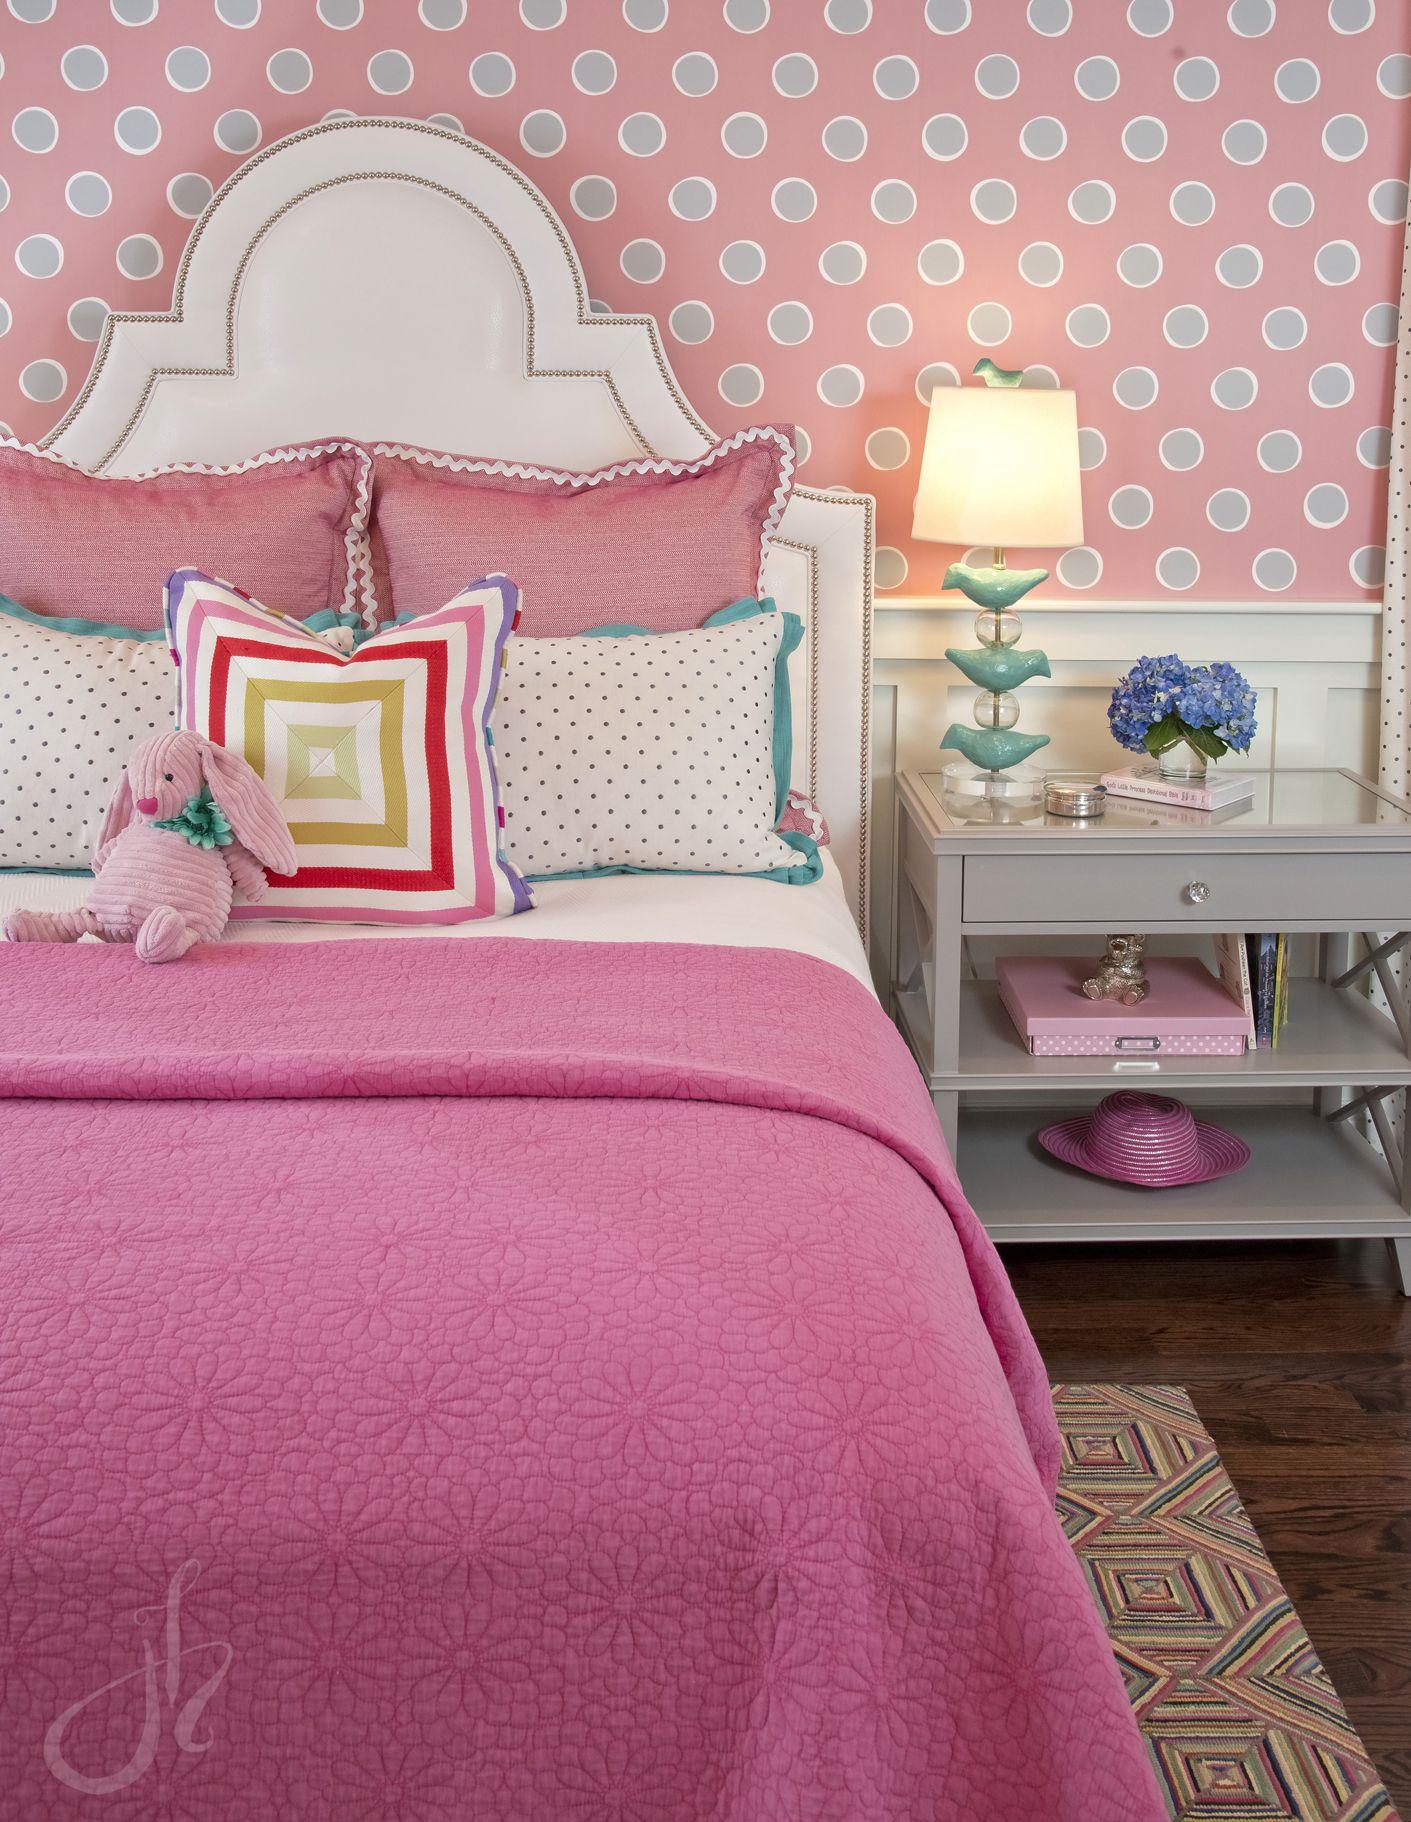 girls bedroom upholstered headboard leather upholstered headboard